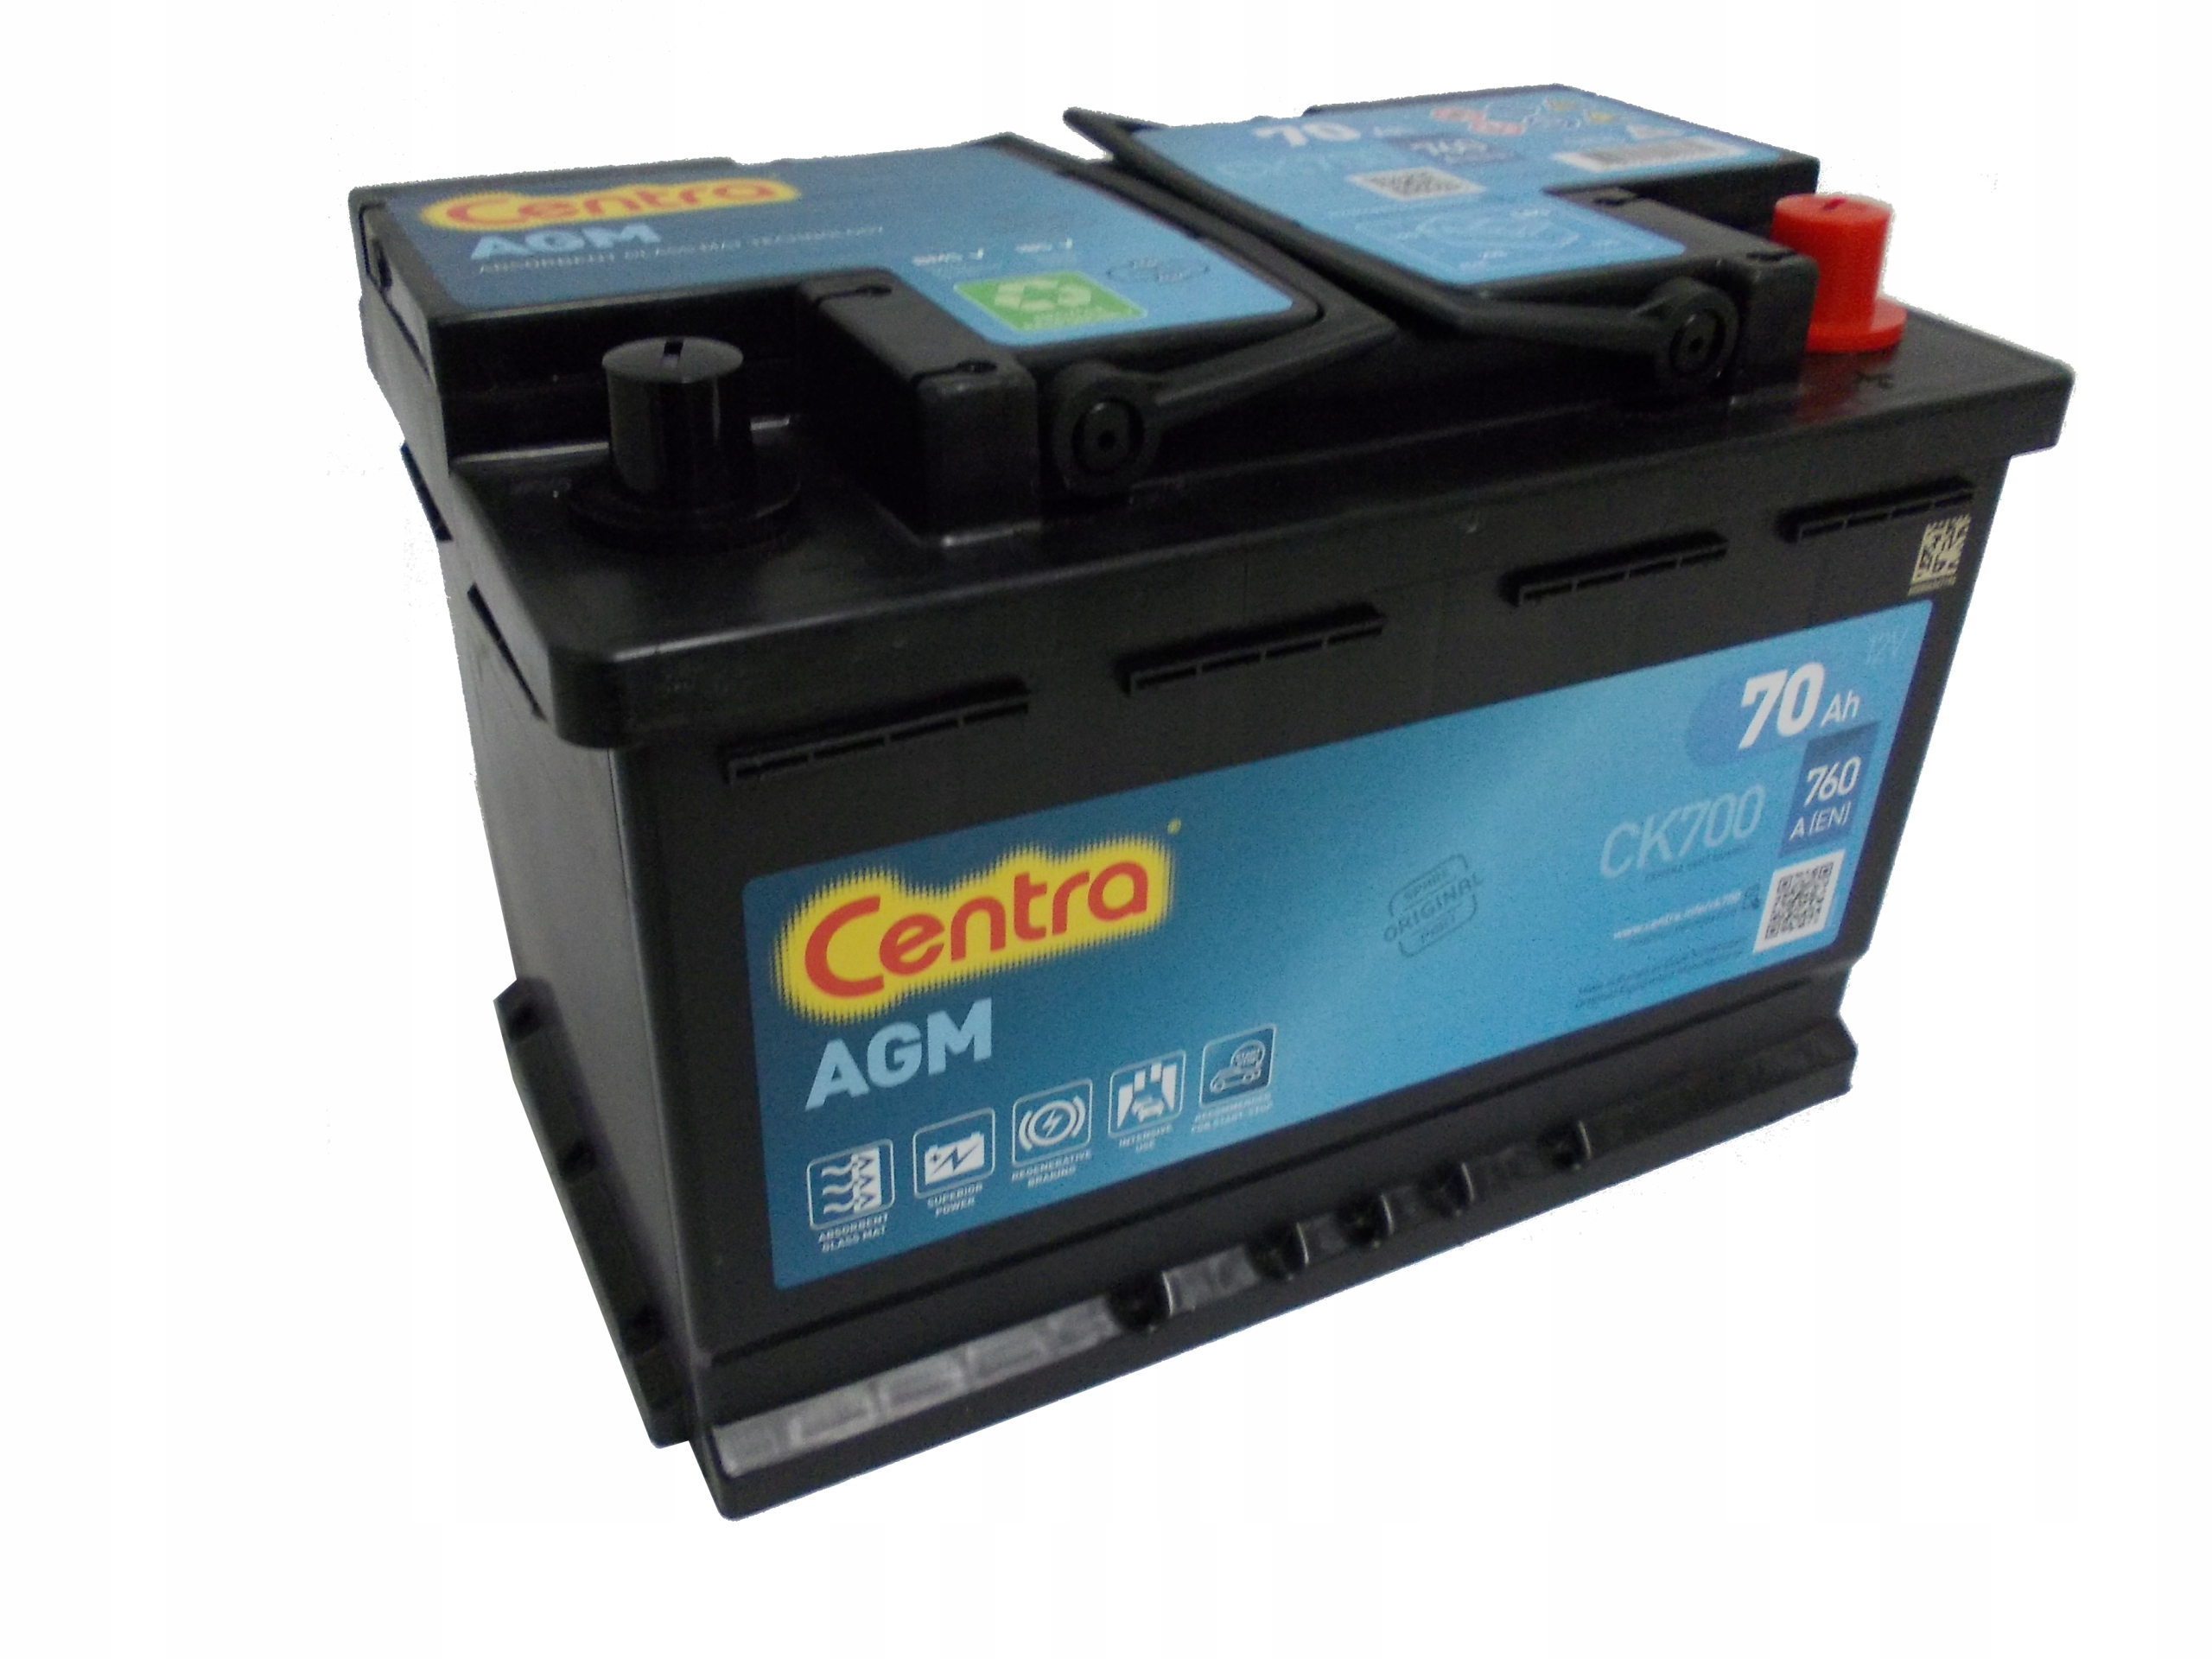 аккумулятор центры пуск стоп ck700 70ah 760a p+